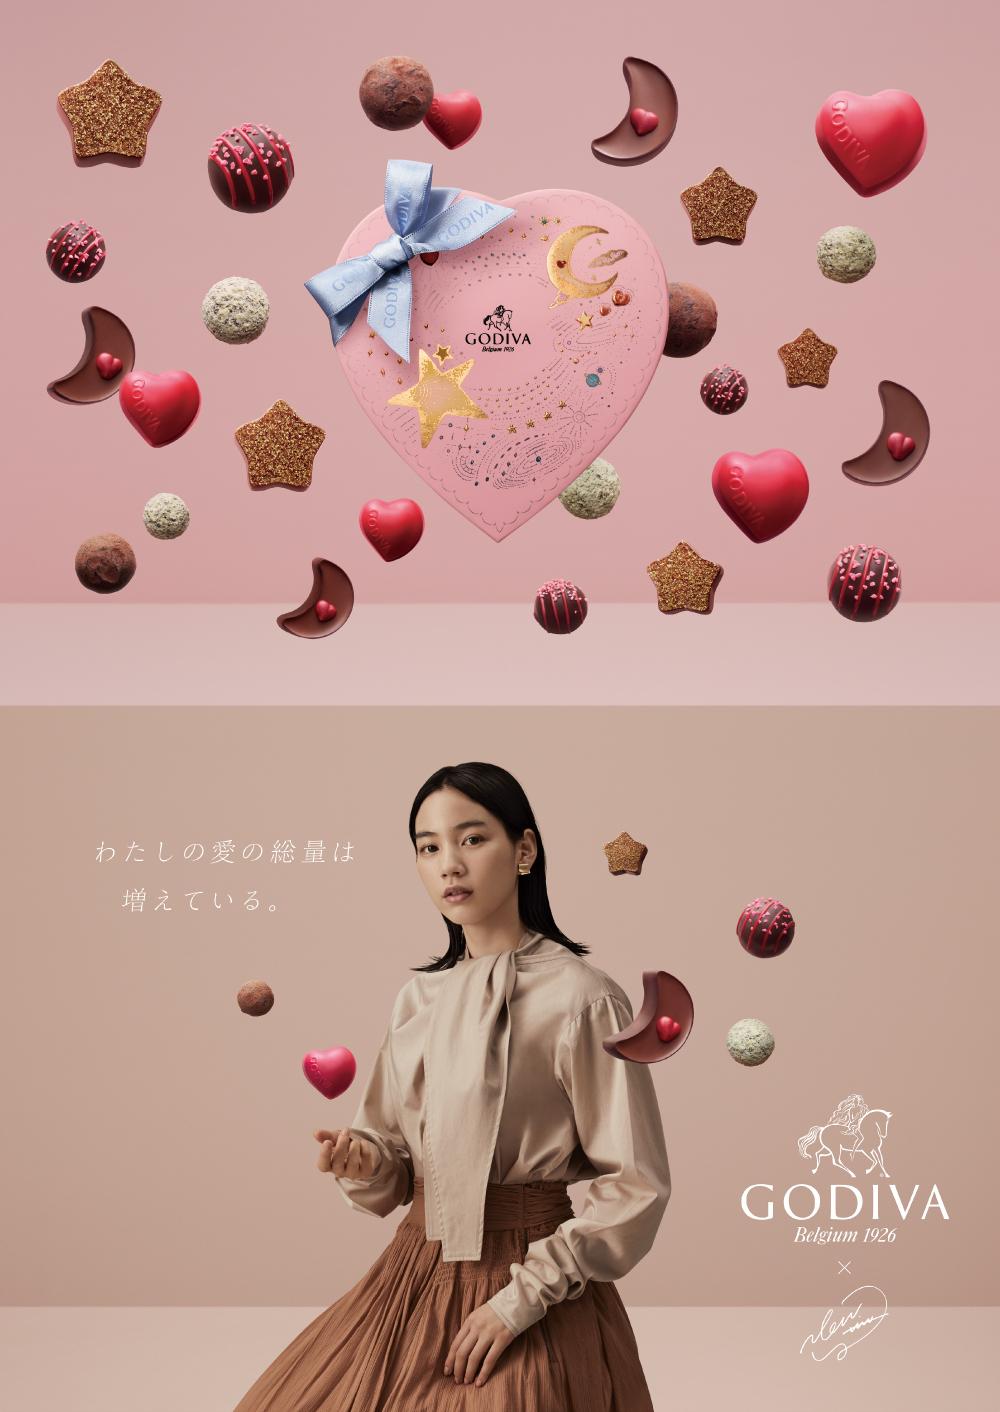 「GODIVA(ゴディバ)」の期間限定ショップがモレラ岐阜にオープン!!